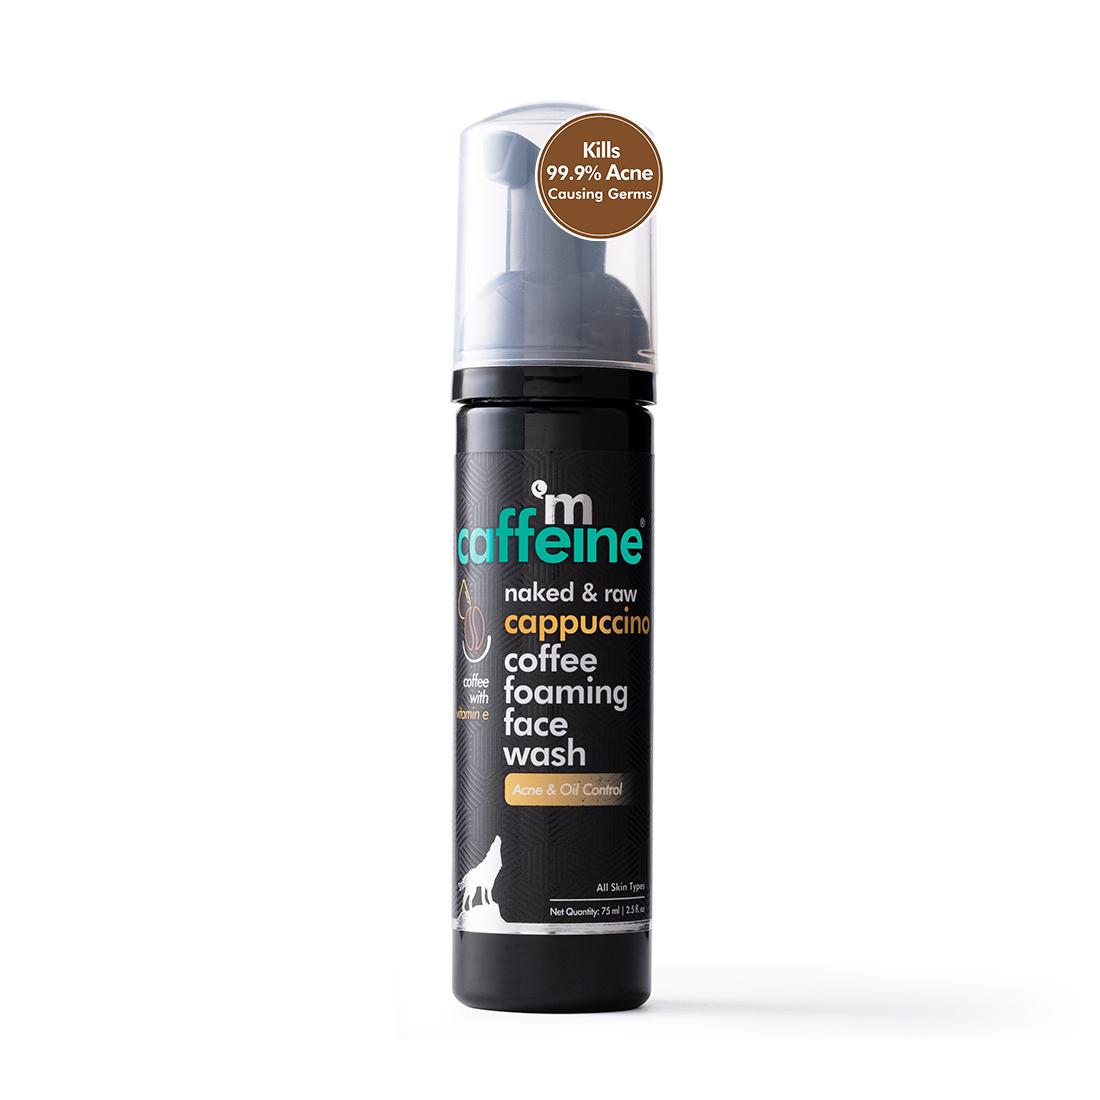 MCaffeine | mCaffeine Naked & Raw Cappuccino Coffee Foaming Face Wash